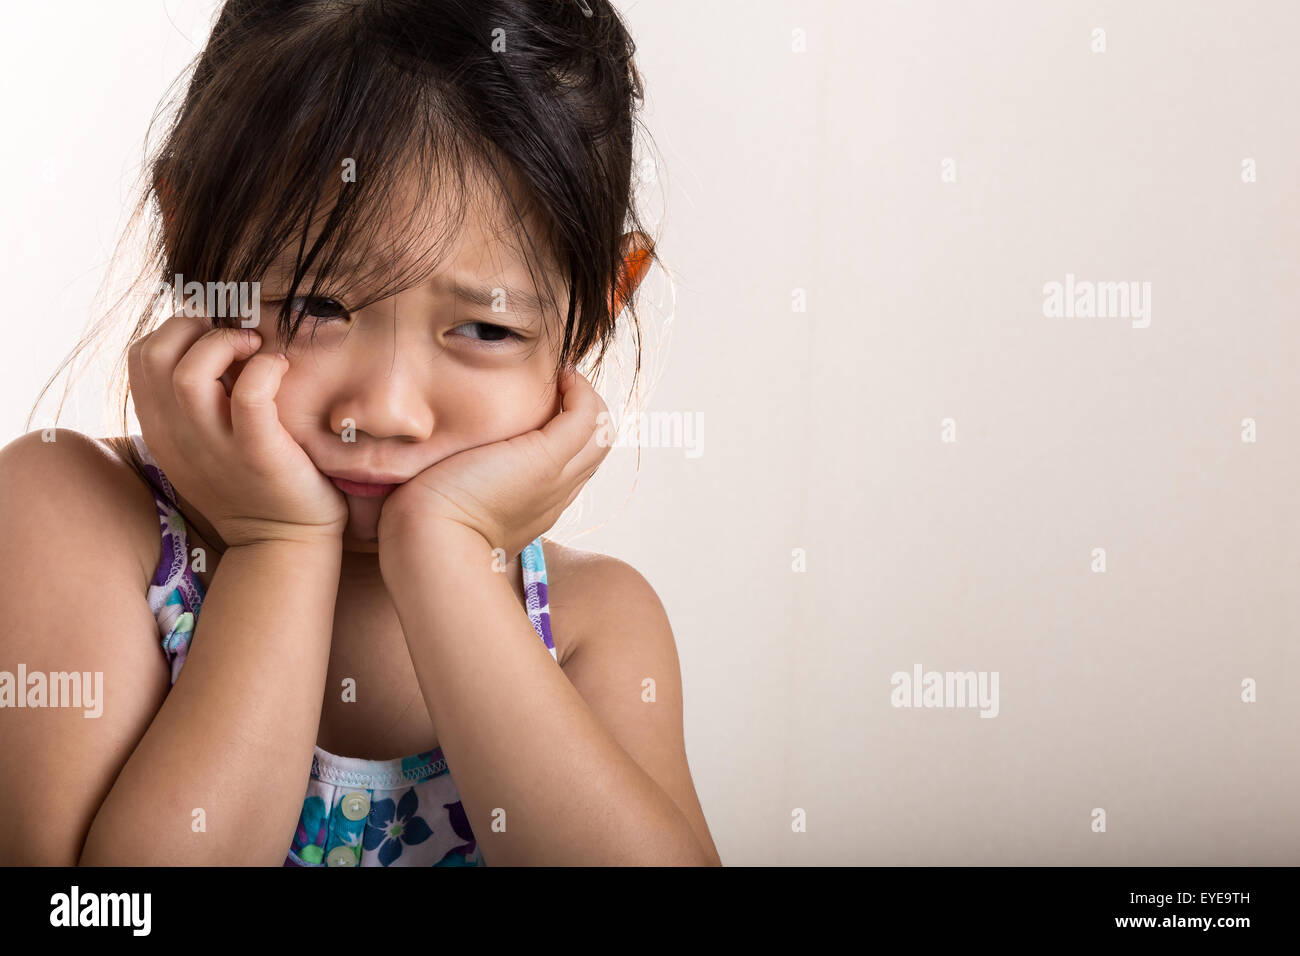 Triste niña aislado sobre fondo blanco. Foto de stock